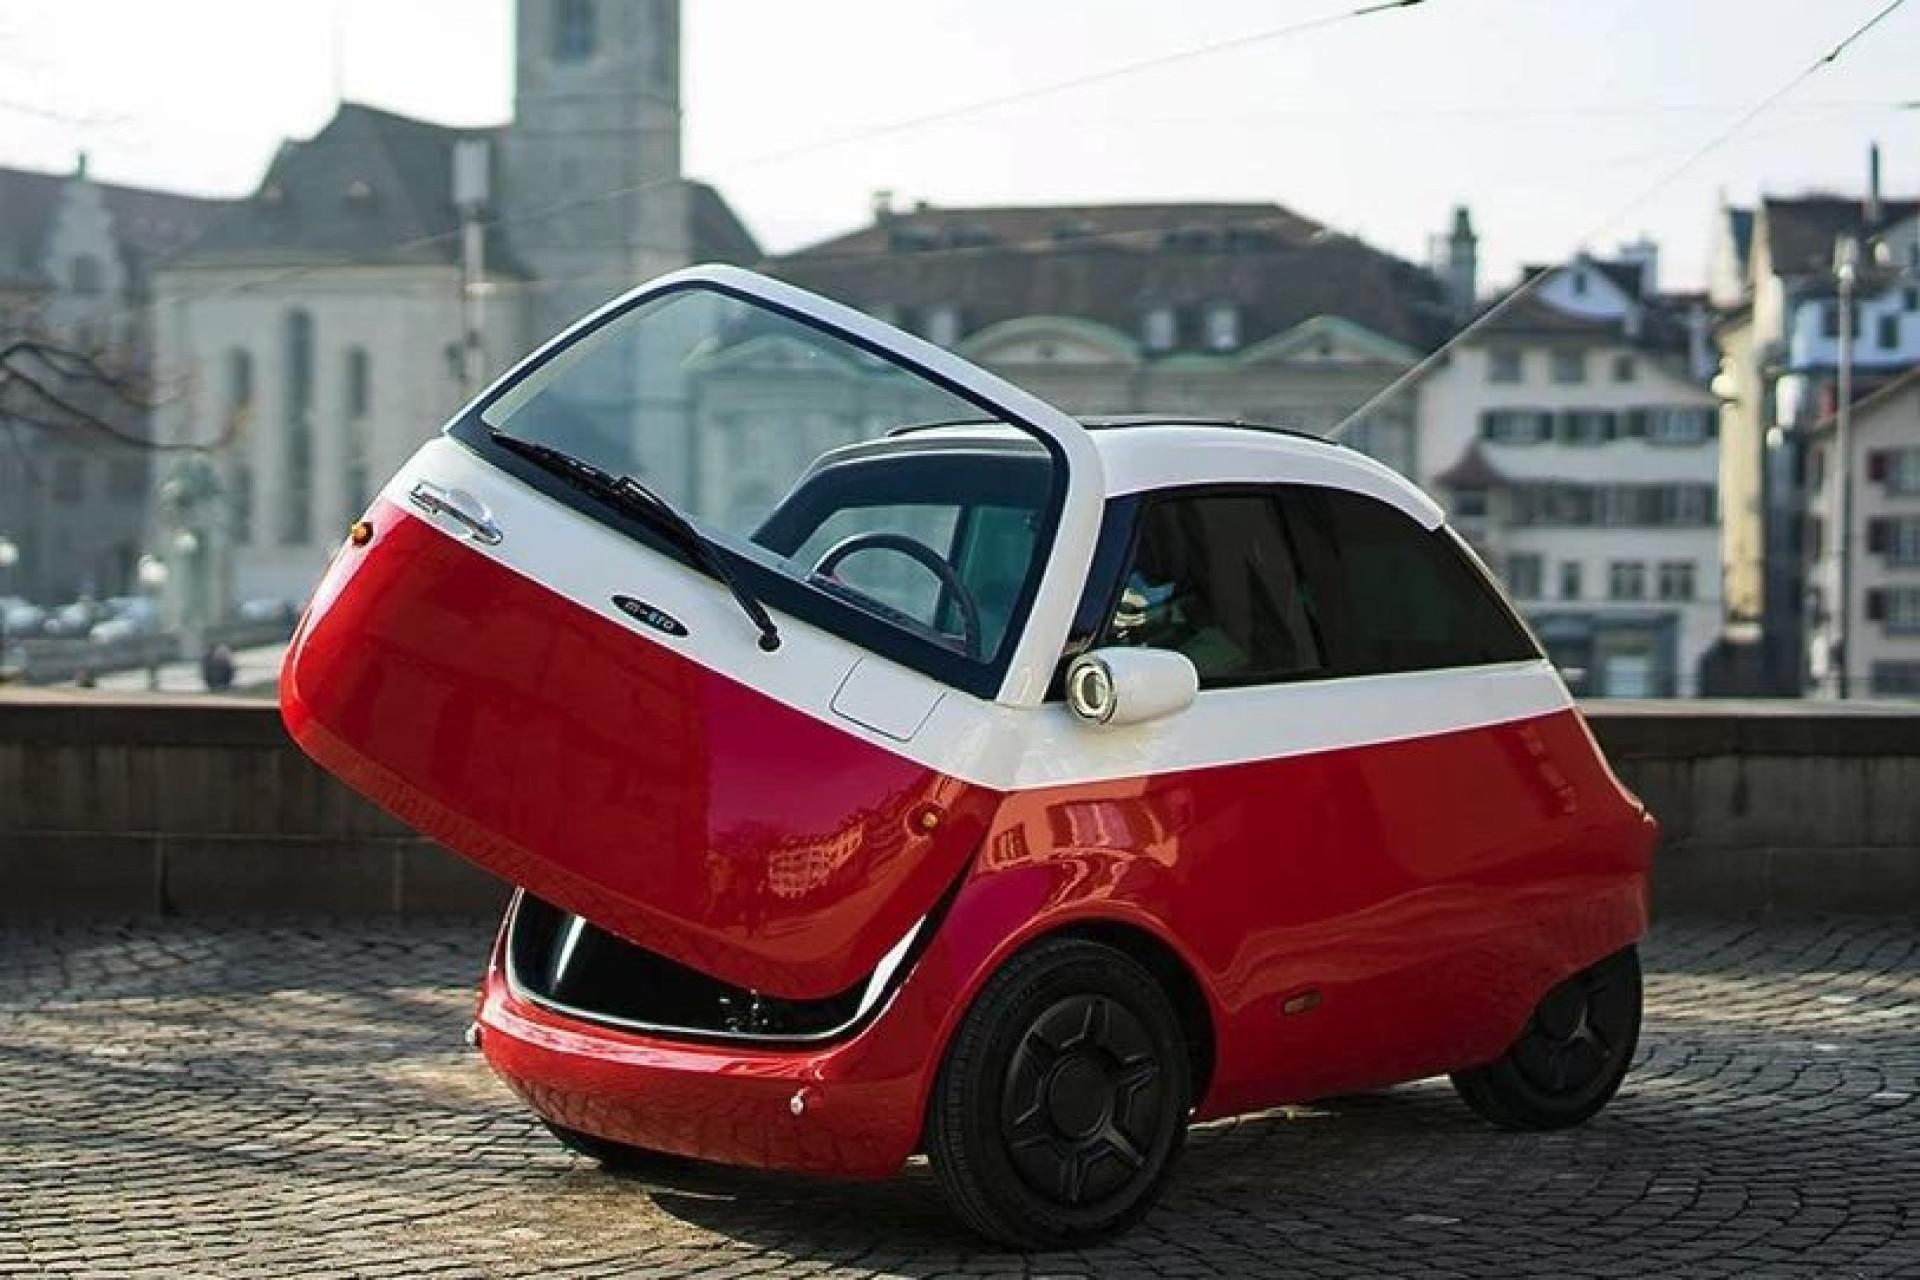 Microlino, o carro elétrico que está prestes a 'invadir' a Europa